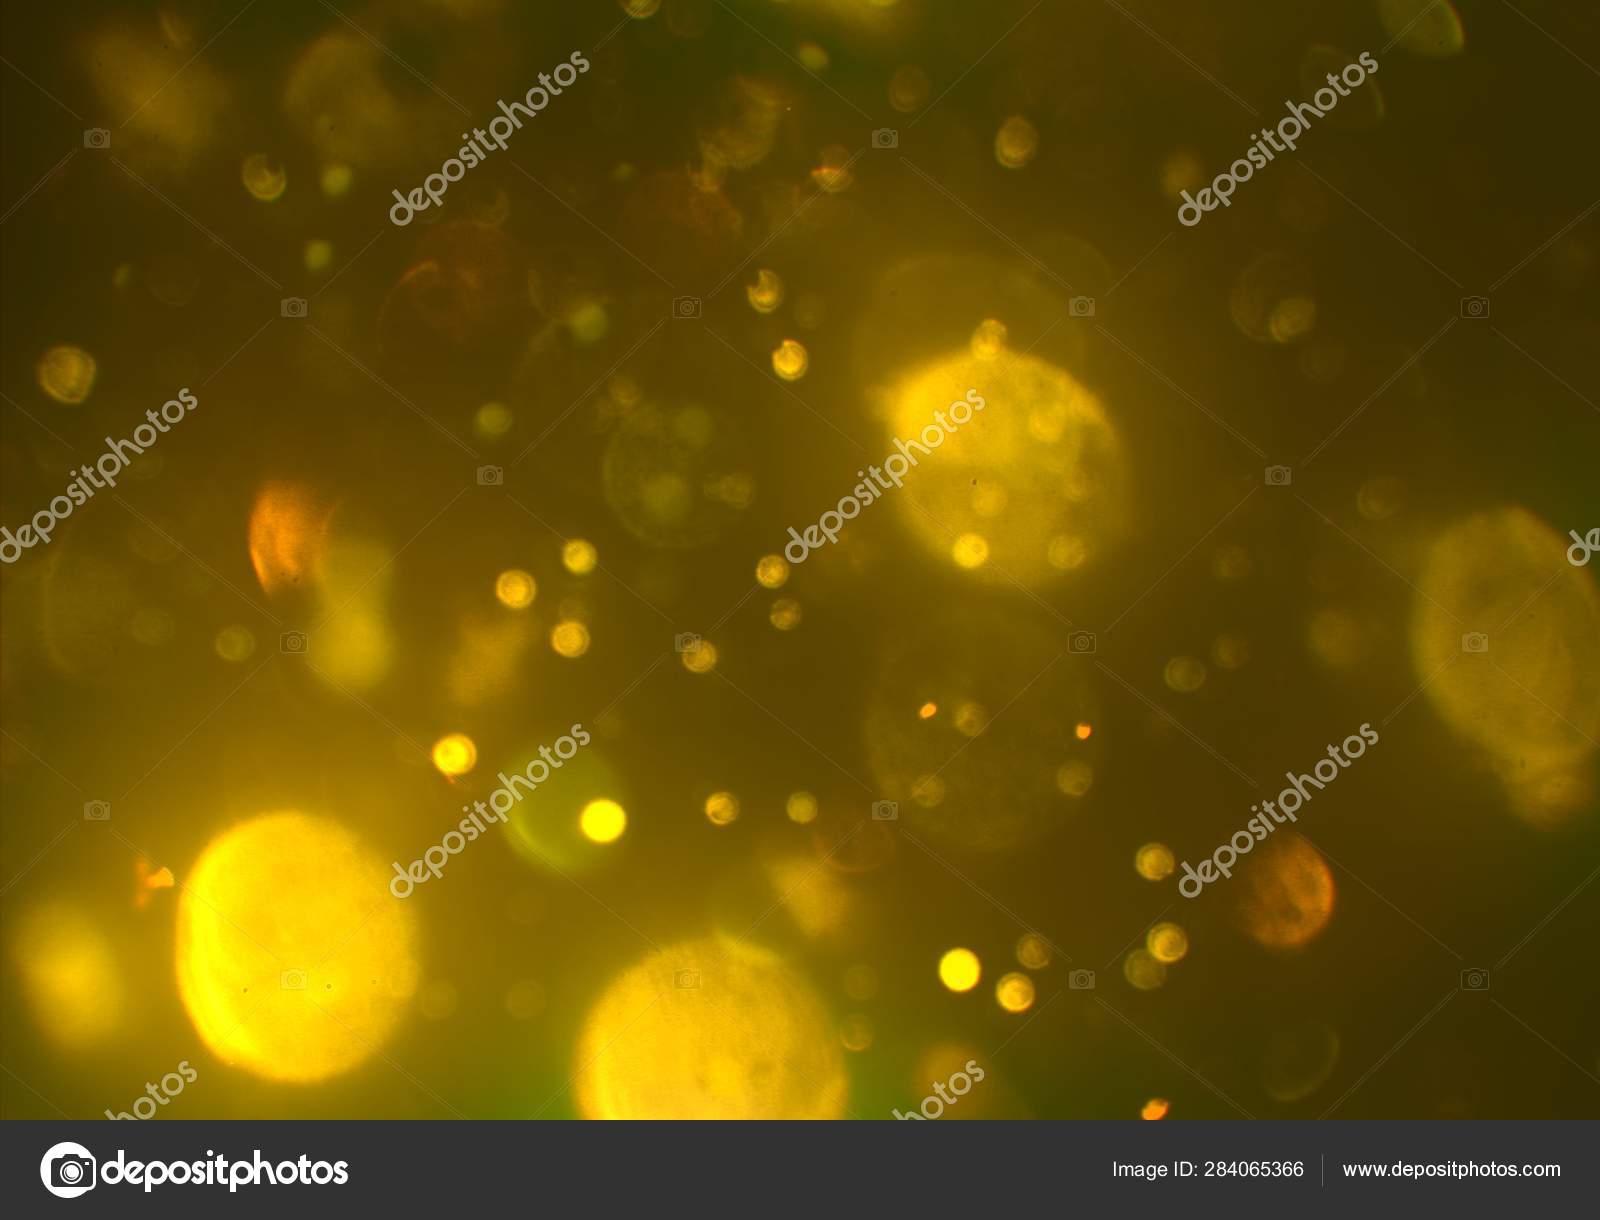 Digital Wallpaper Shiny Bokeh Lights Stock Photo C Nordenworks Gmail Com 284065366